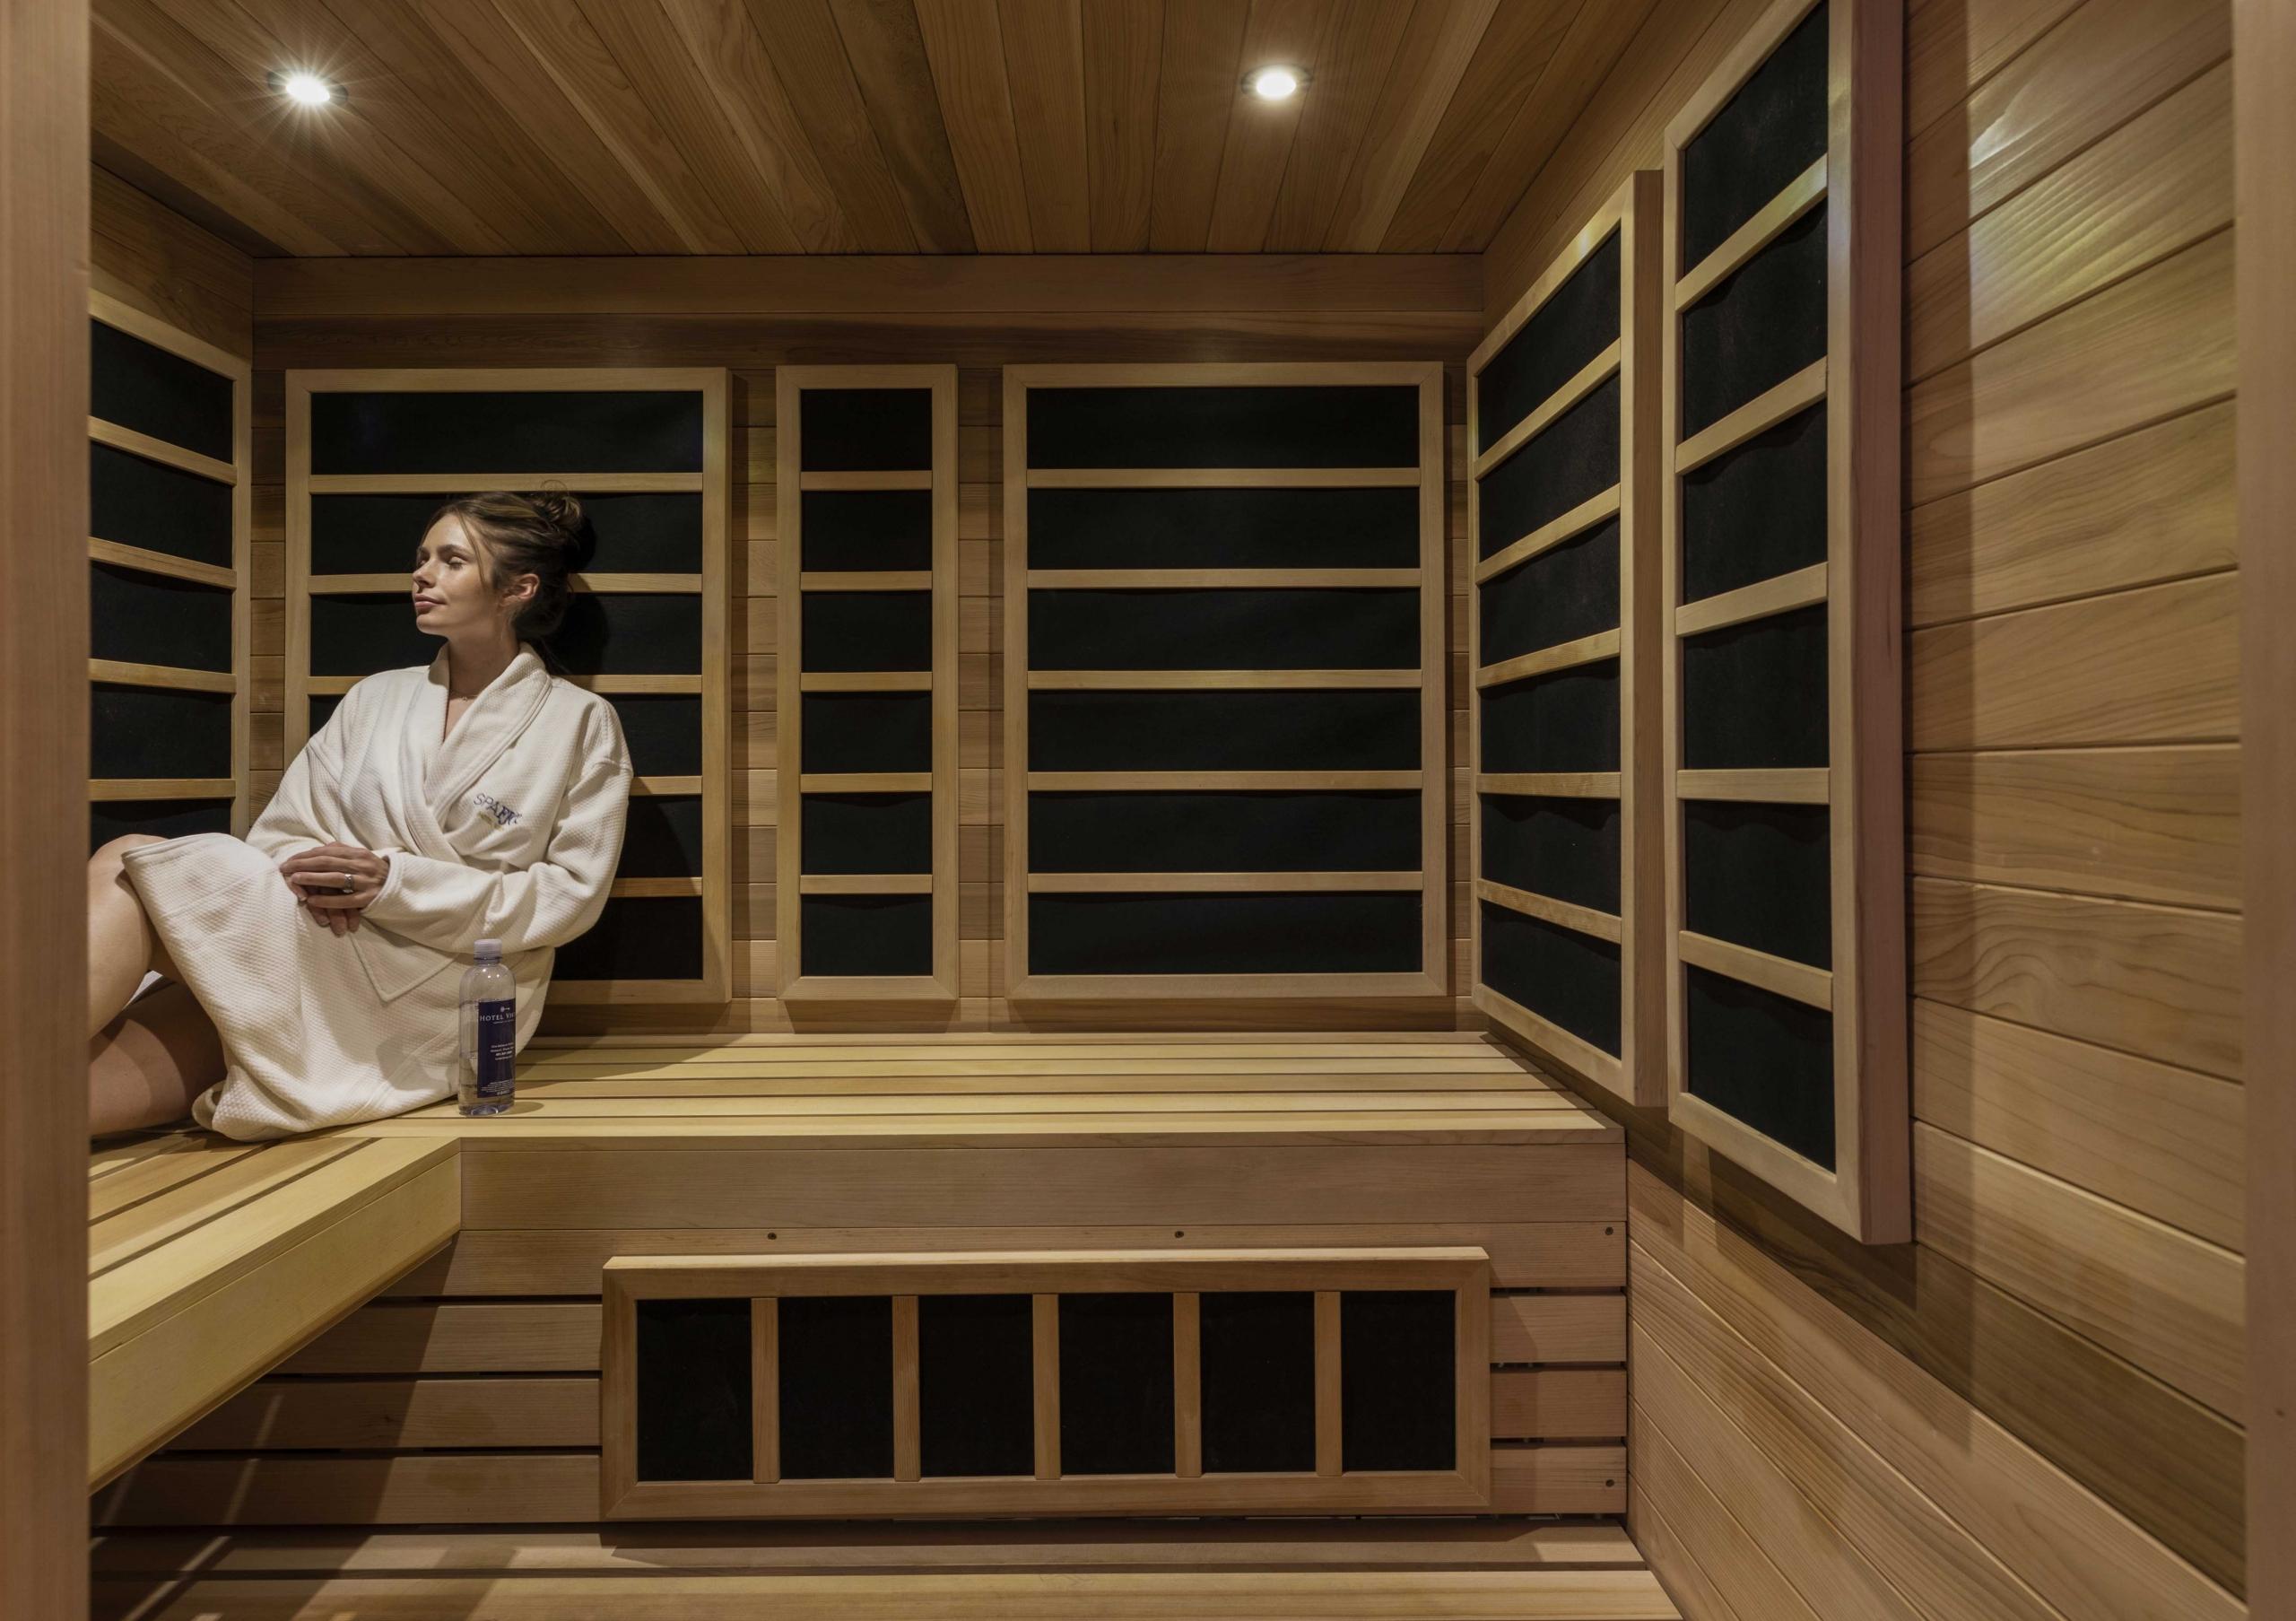 woman sitting and enjoying the sauna